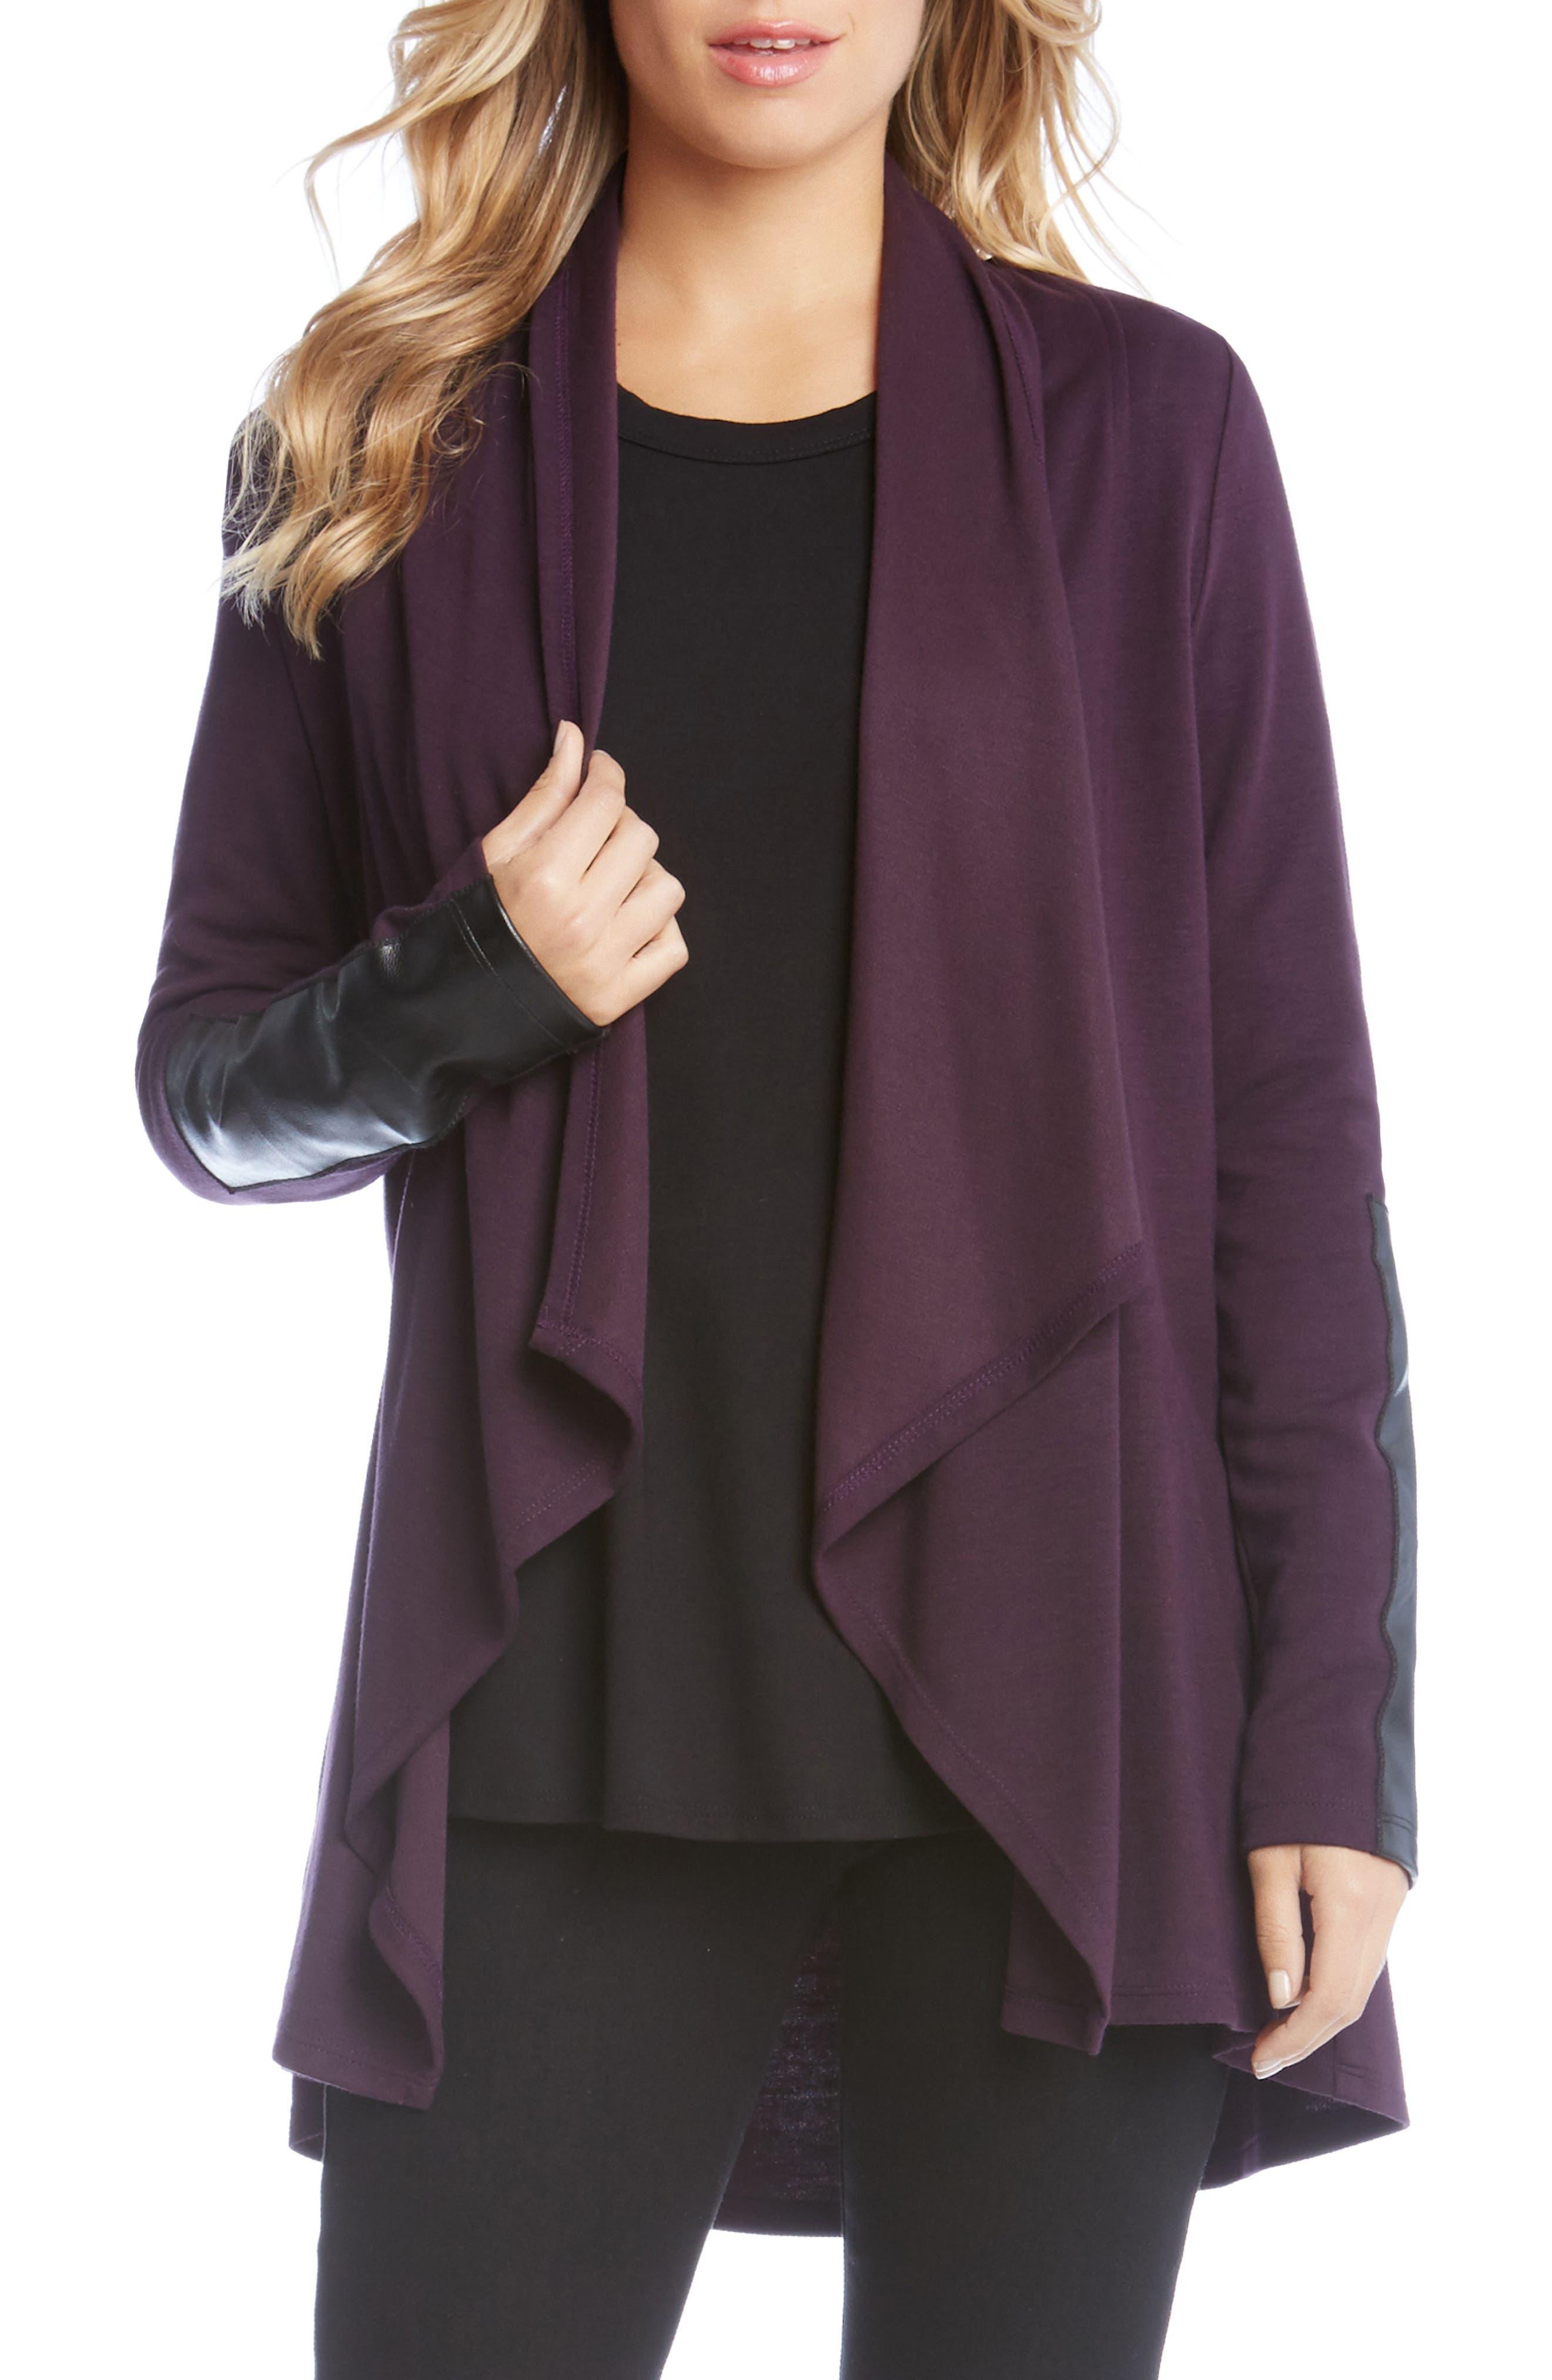 Alternate Image 1 Selected - Karen Kane Faux Leather Patch Fleece Knit Jacket